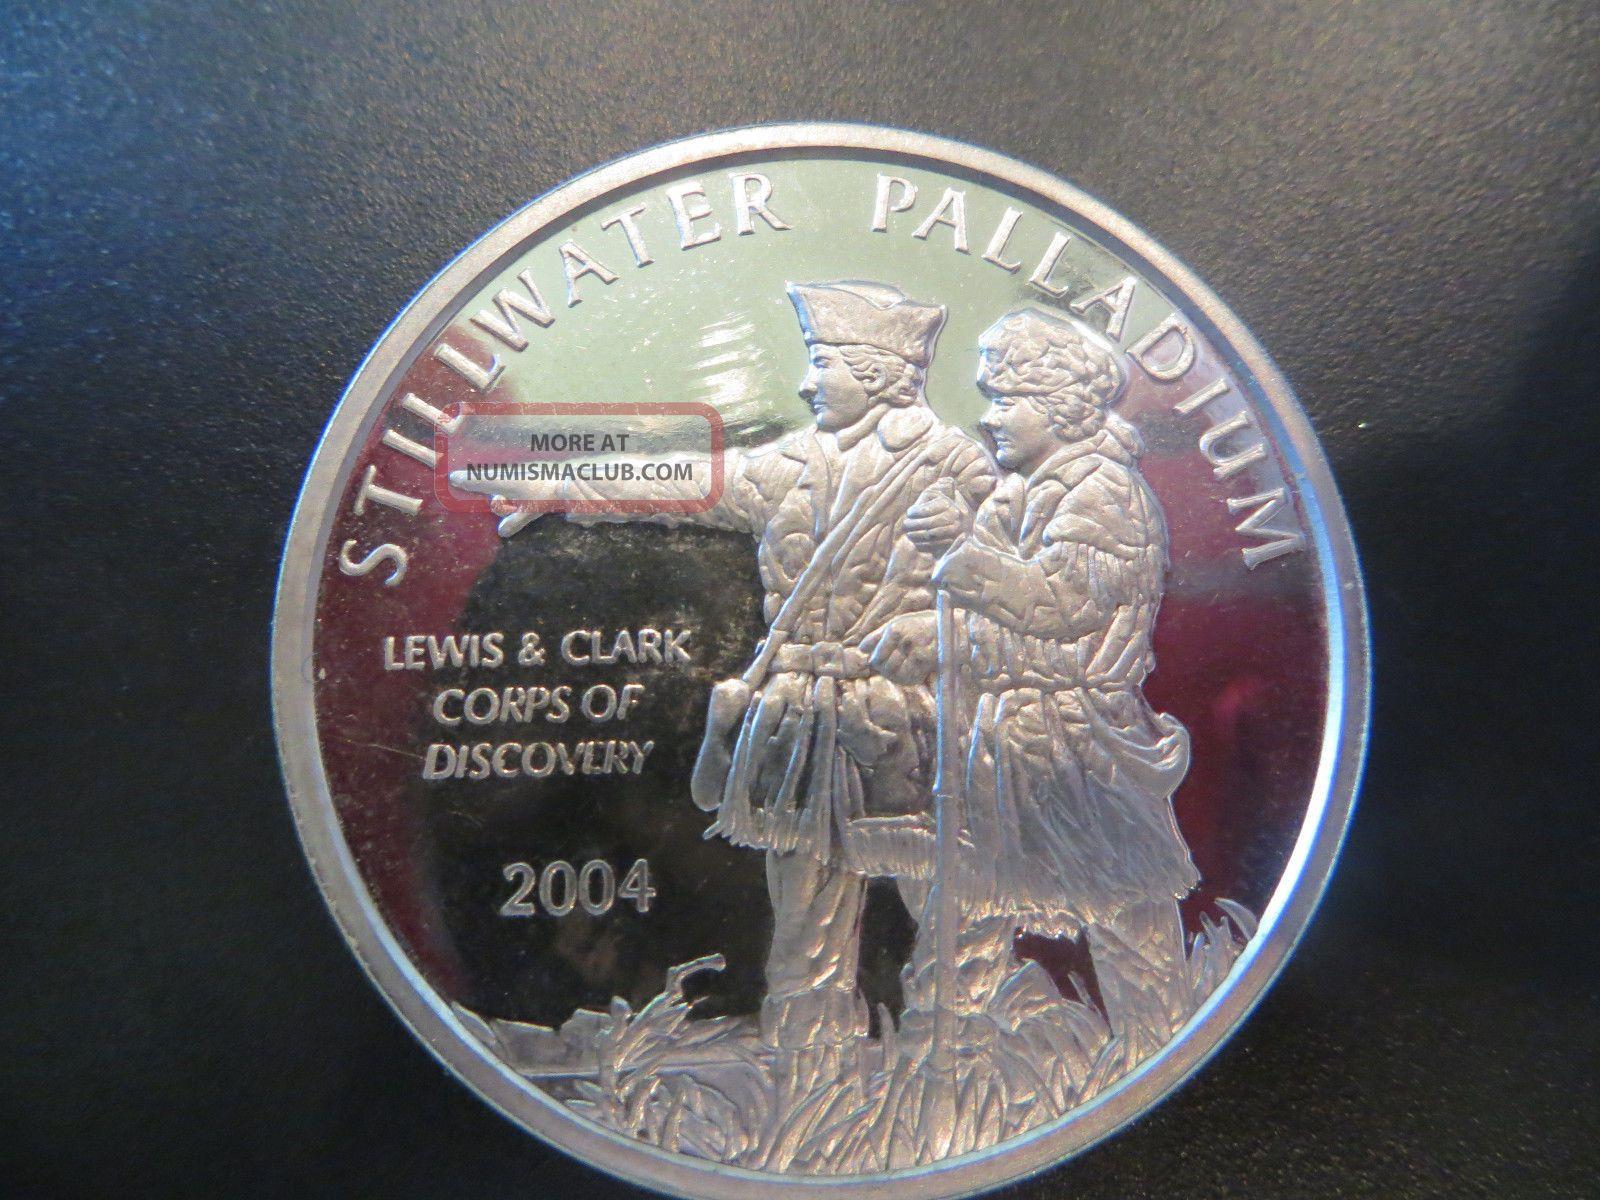 2004 Stillwater Palladium Lewis & Clark 1 Troy Oz Palladium Coin Bullion photo